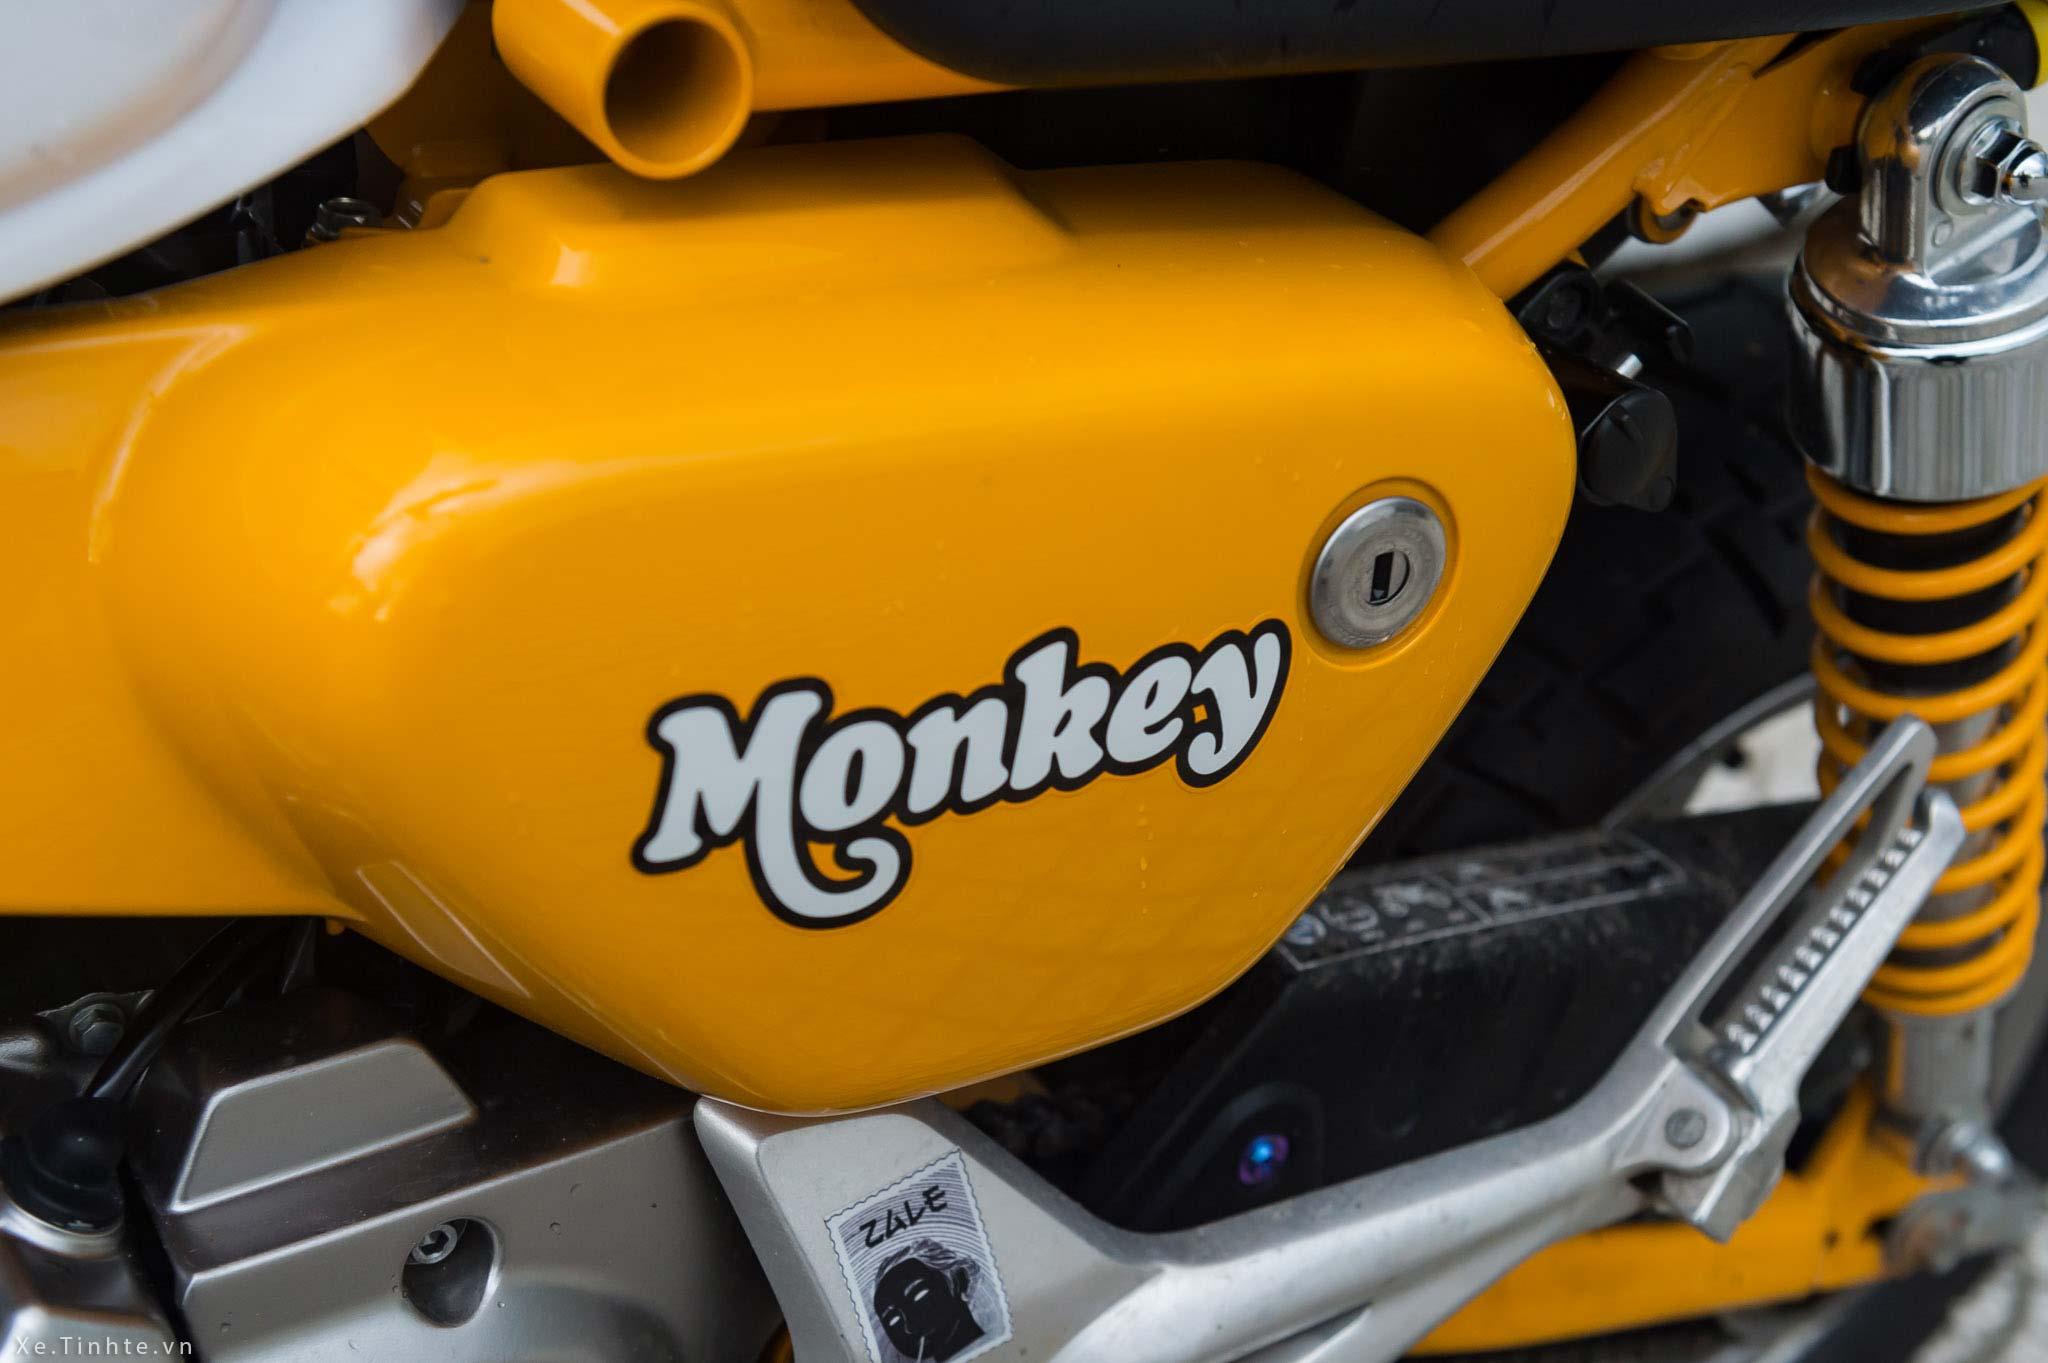 Honda_Monkey_125_Xe_Tinhte (44).jpg